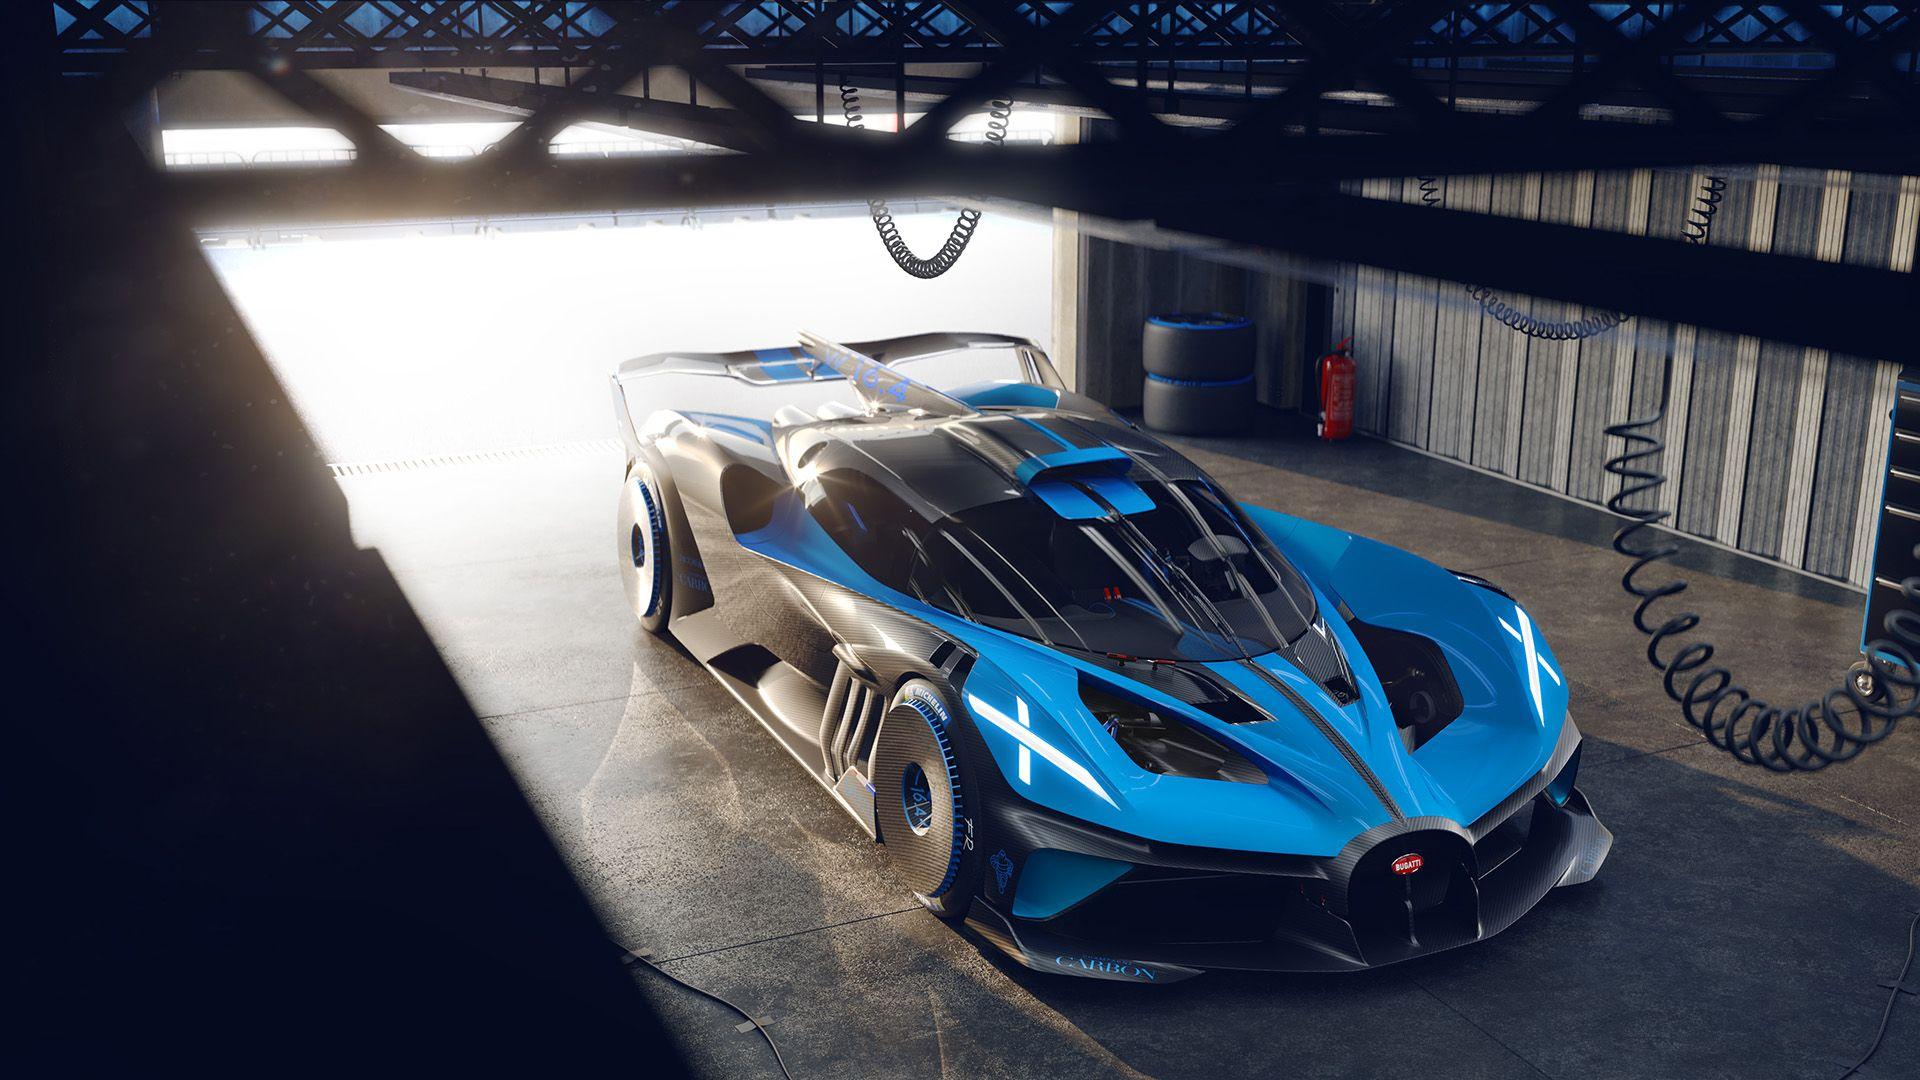 Bugatti Bolide Is An 1825 Hp Lightweight Track Monster